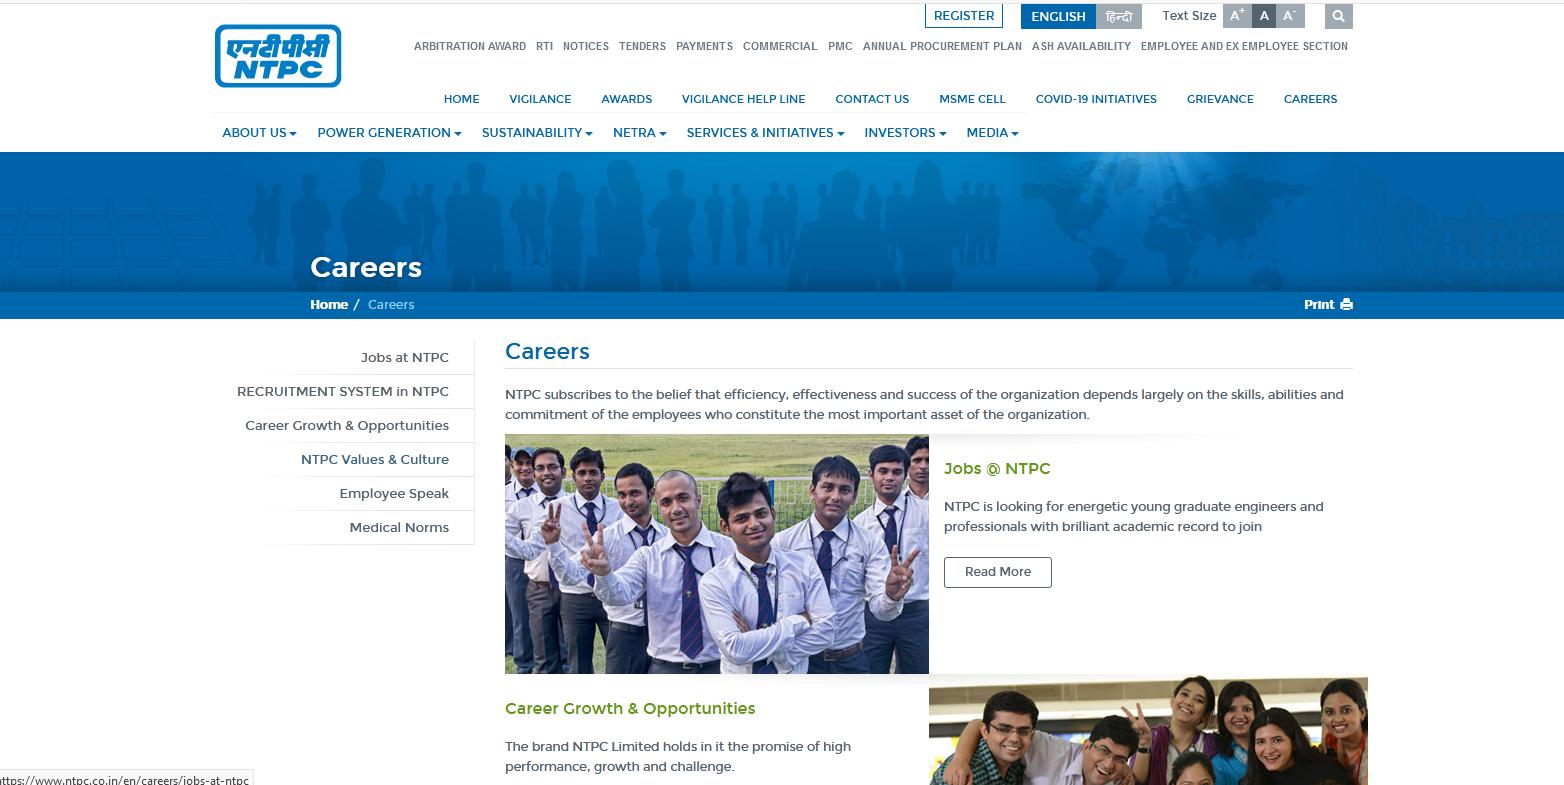 NTPC 2024 WWW.ONLINESTUDYPOINTS.COM